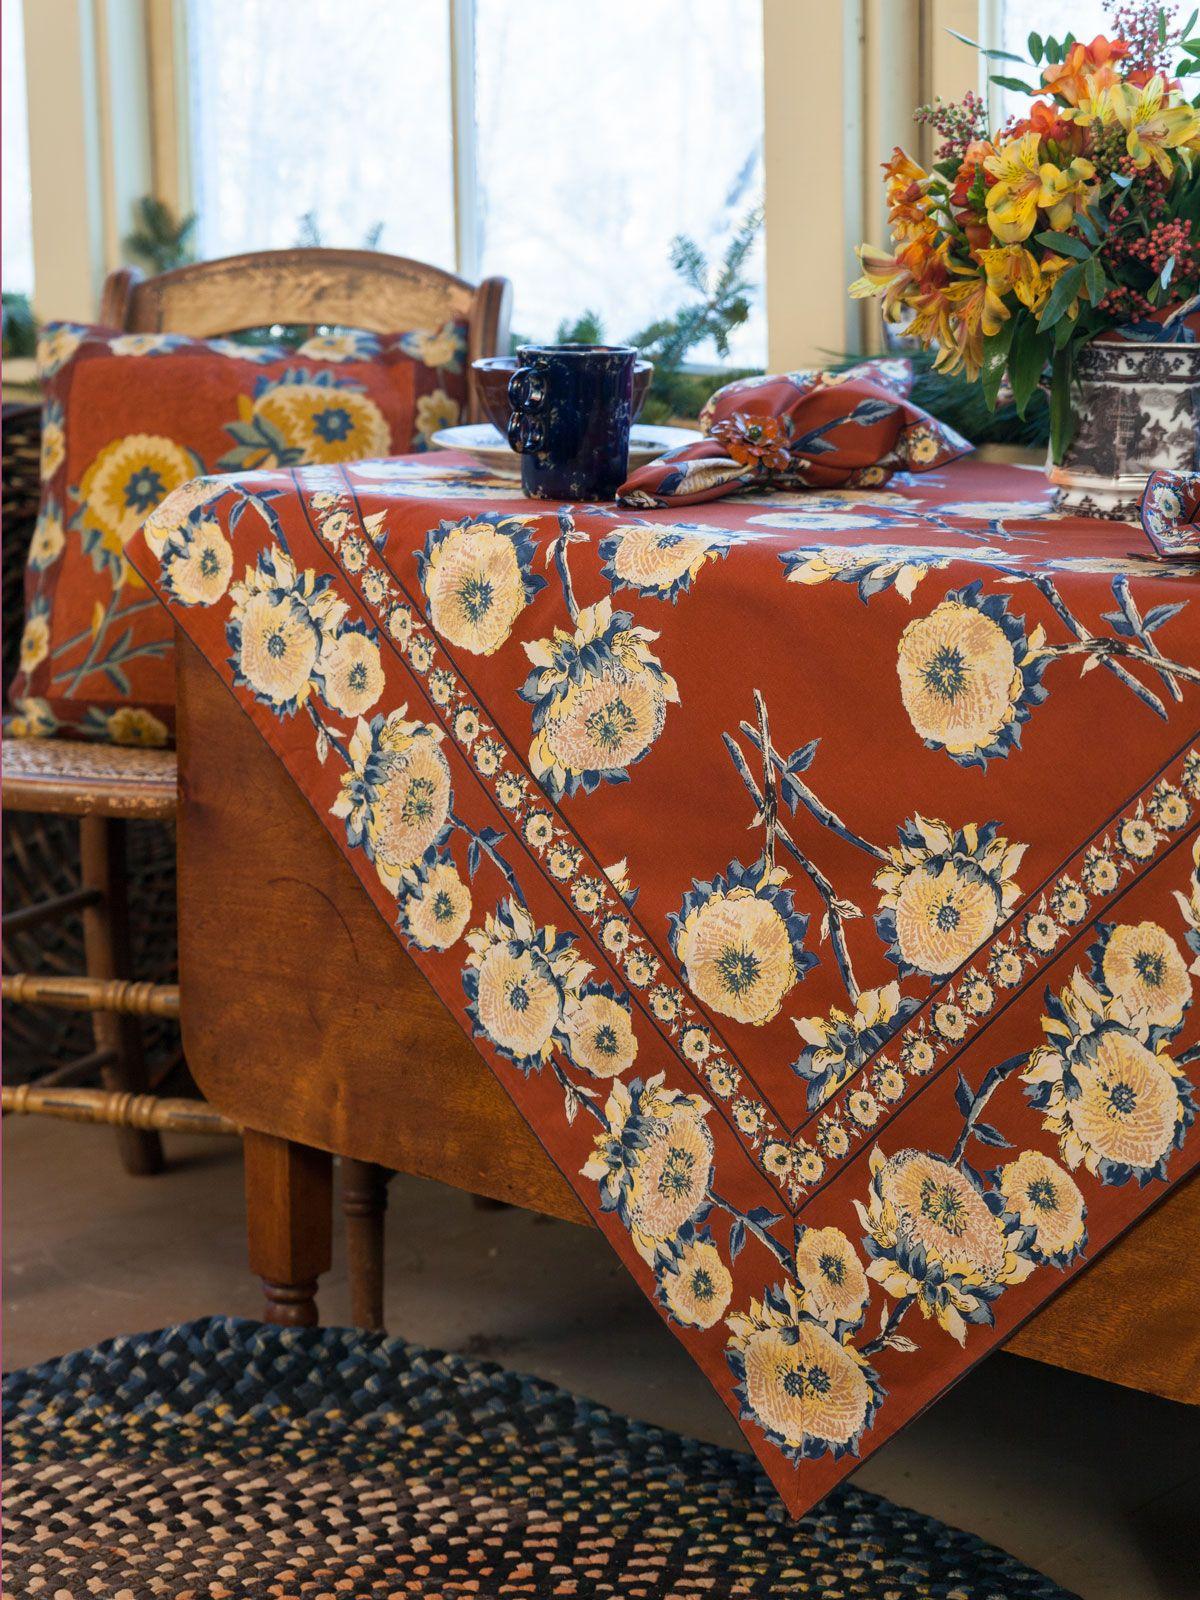 Sun Follower Tablecloth Rust Attic Sale Linens Kitchen